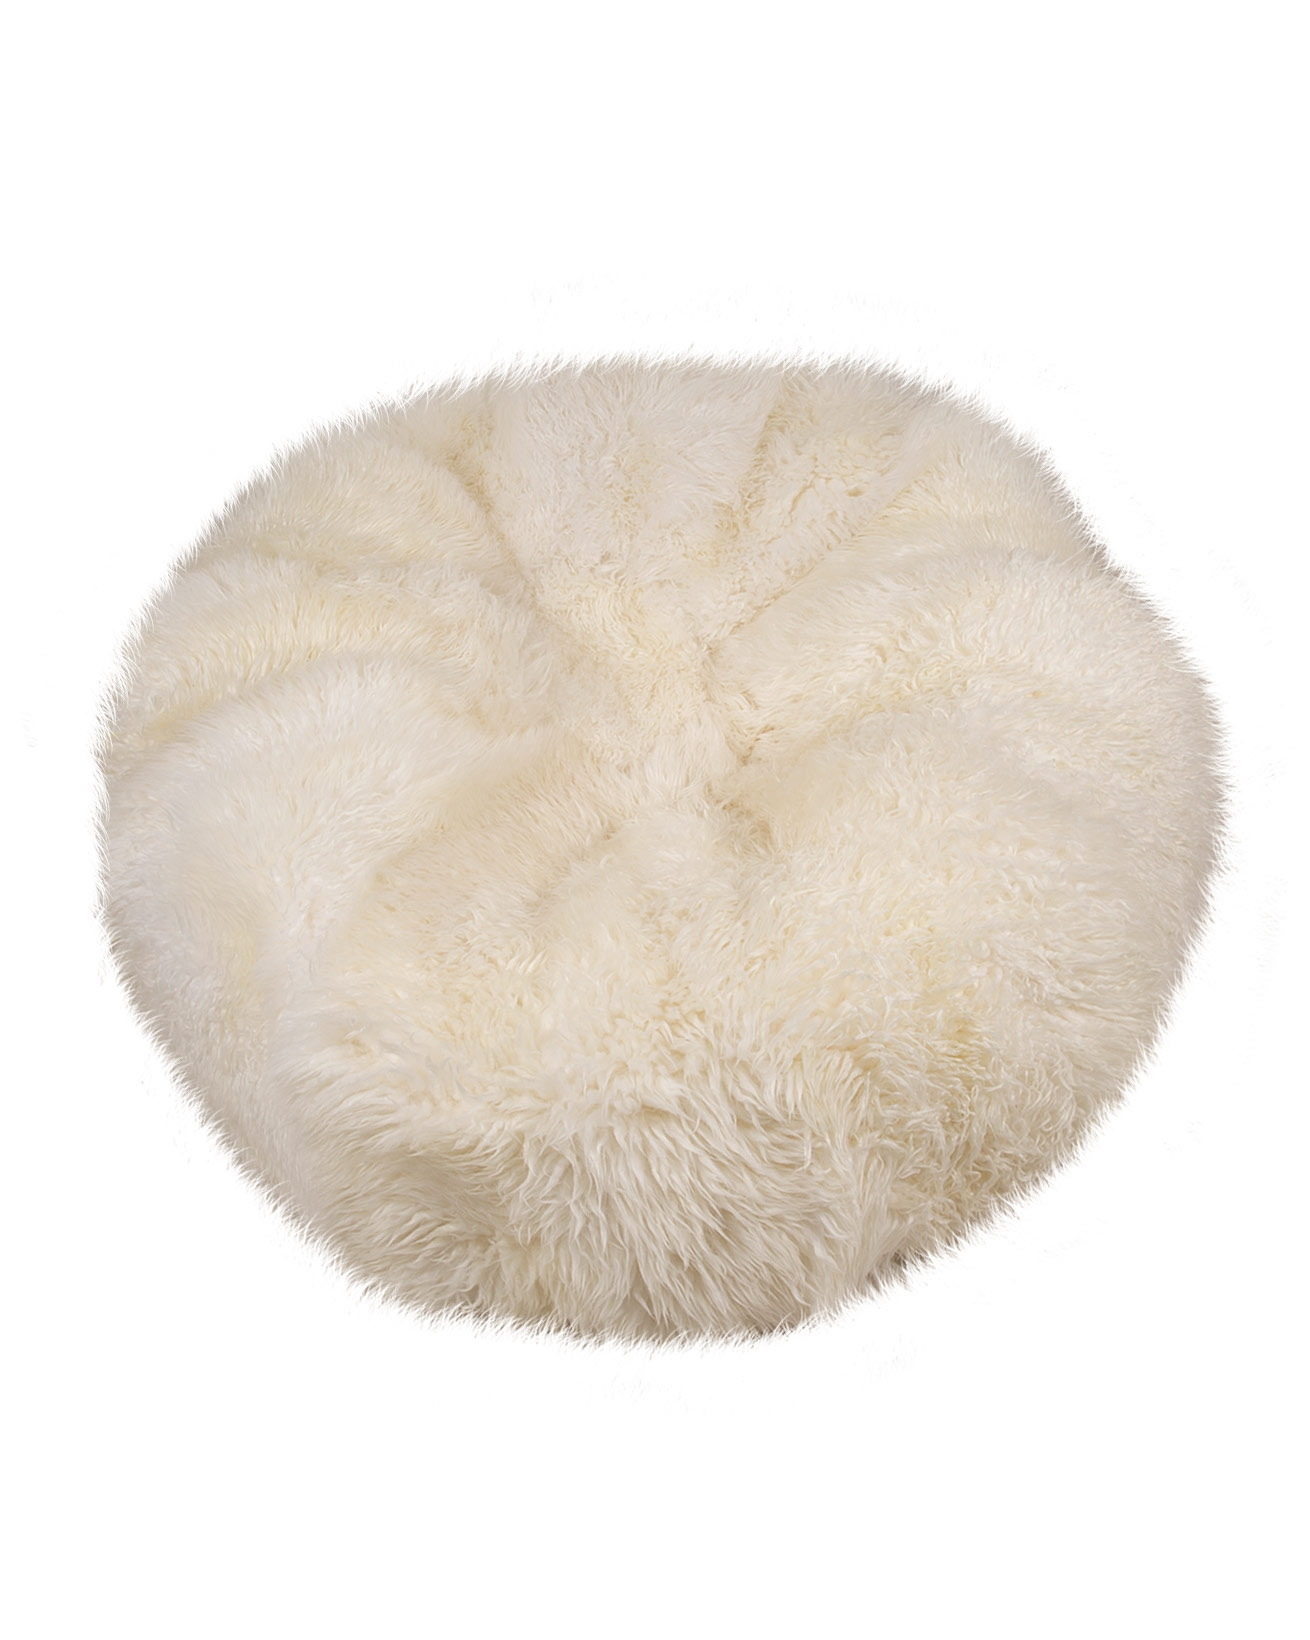 Sheepskin Yeti Beanbag - Large 115cm diameter x 40cm high - Ivory - 1647